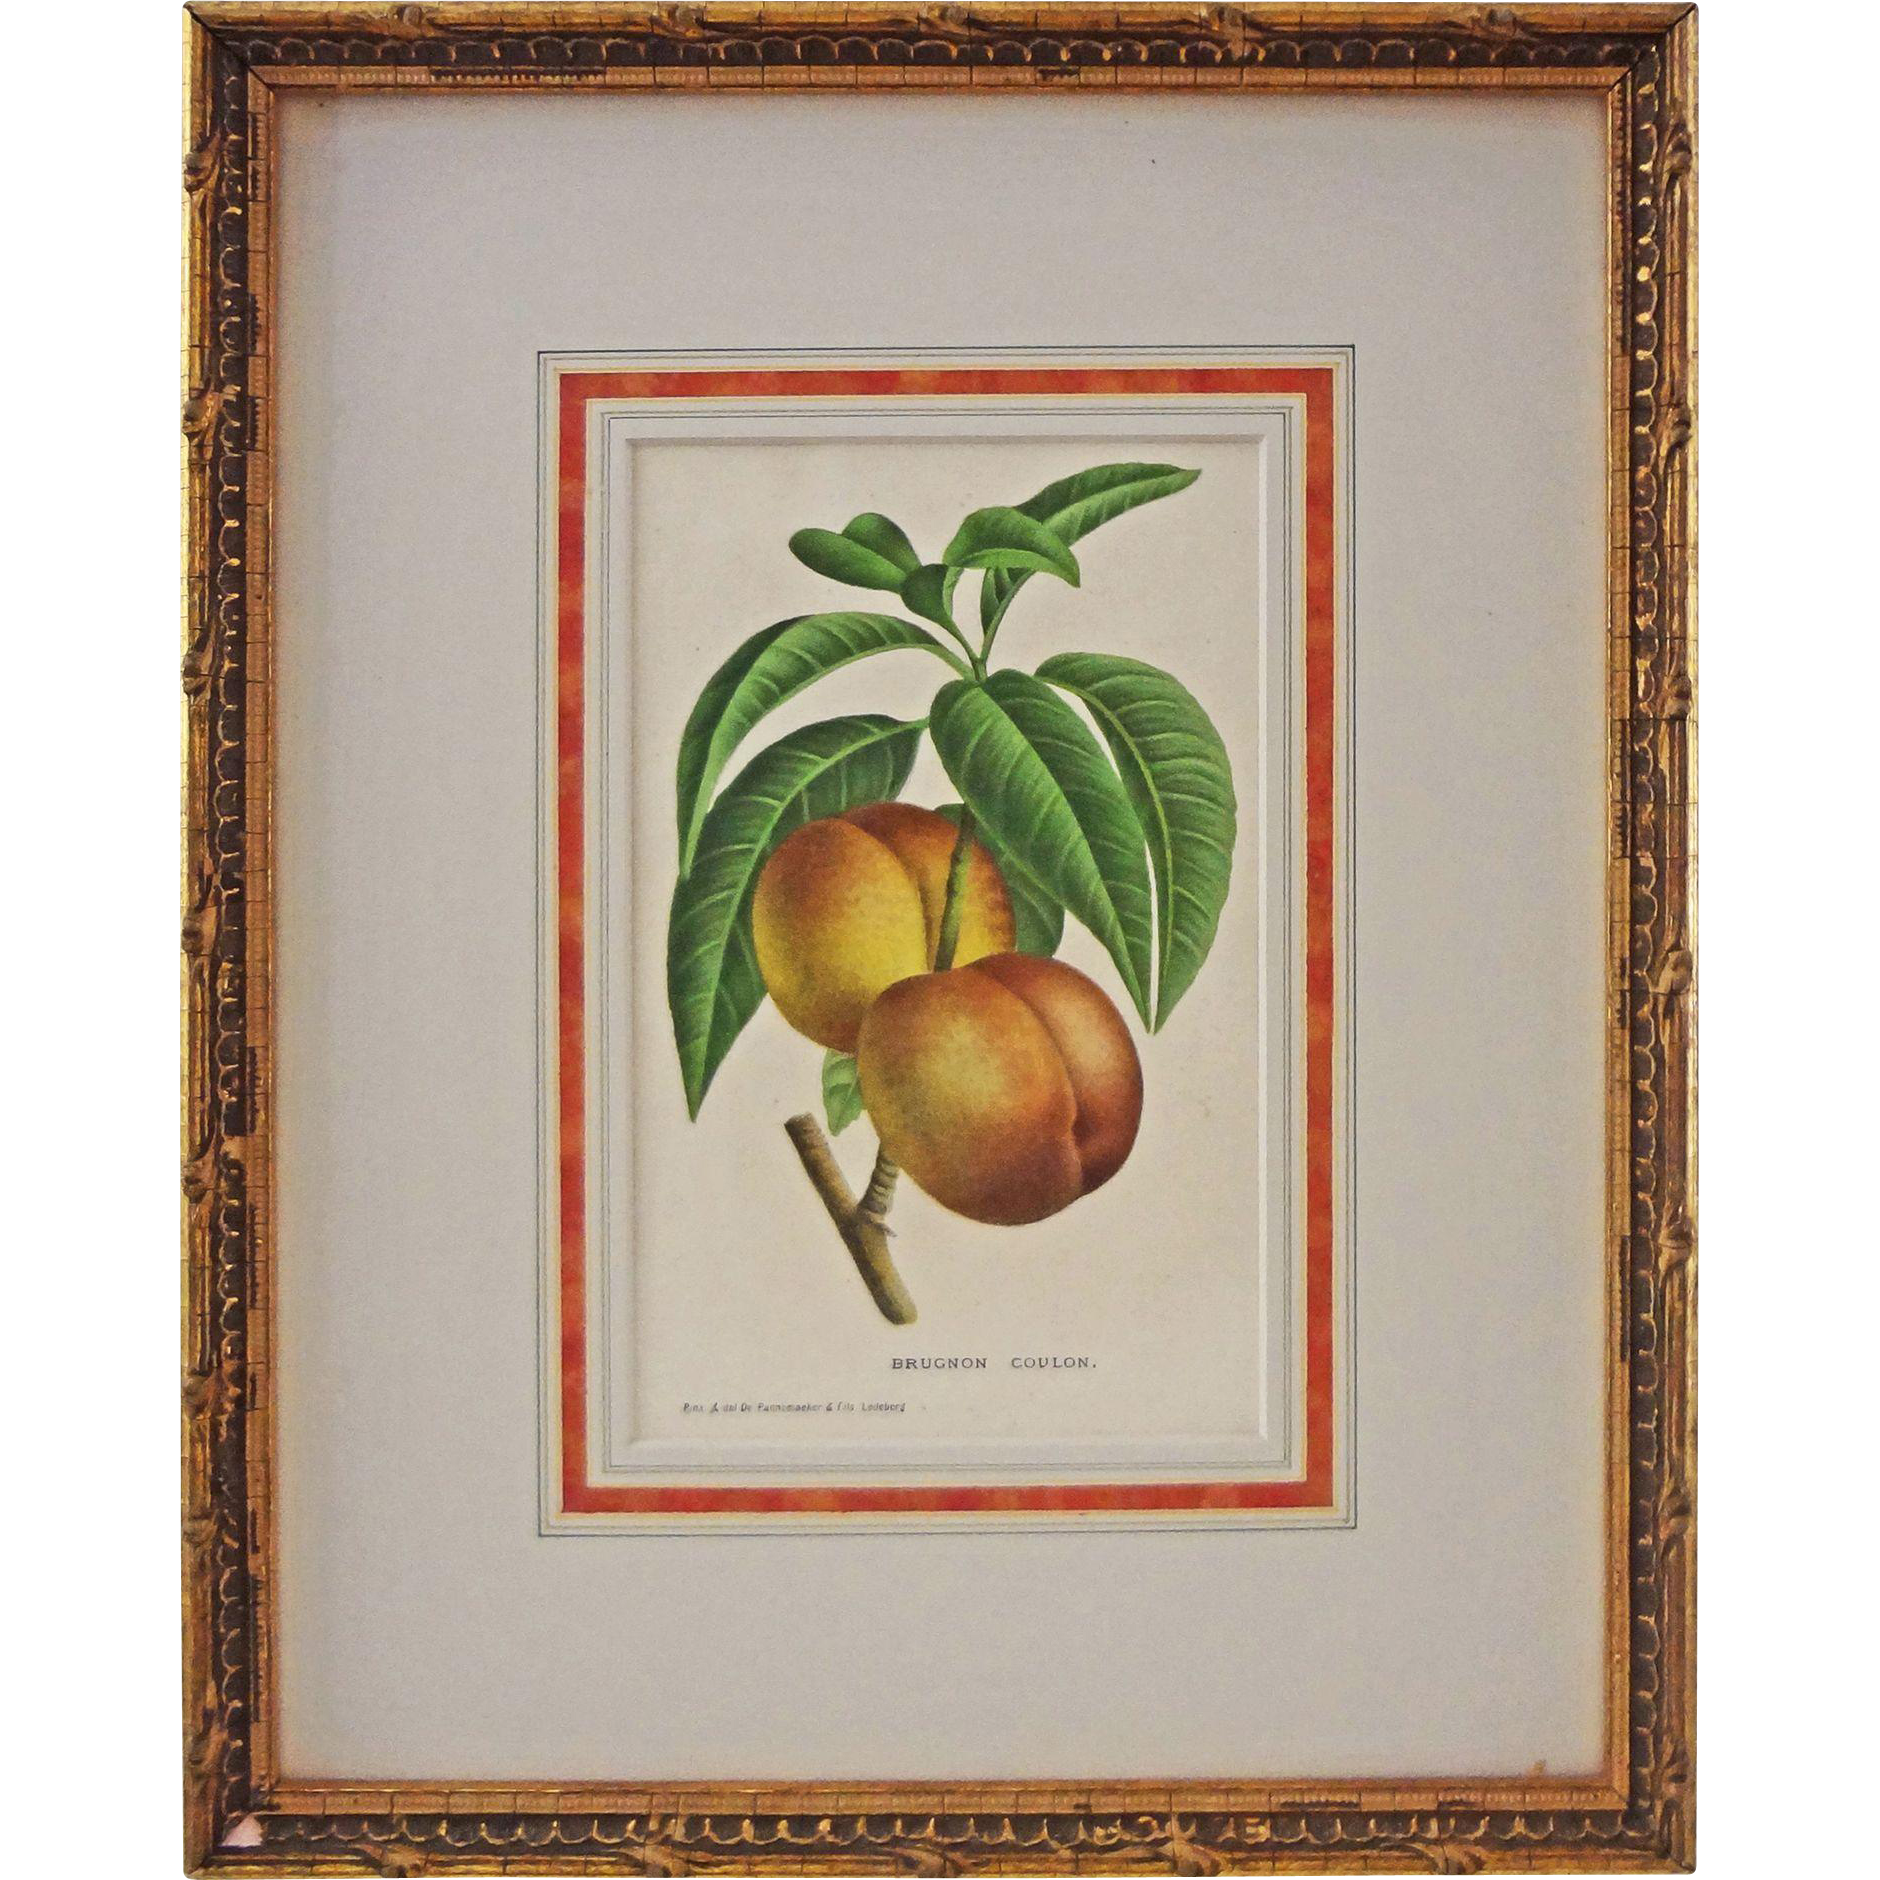 Peach Botanical Lithograph Brugnon Coulon De Pannemaker & Fils - circa 19th Century, Belgium